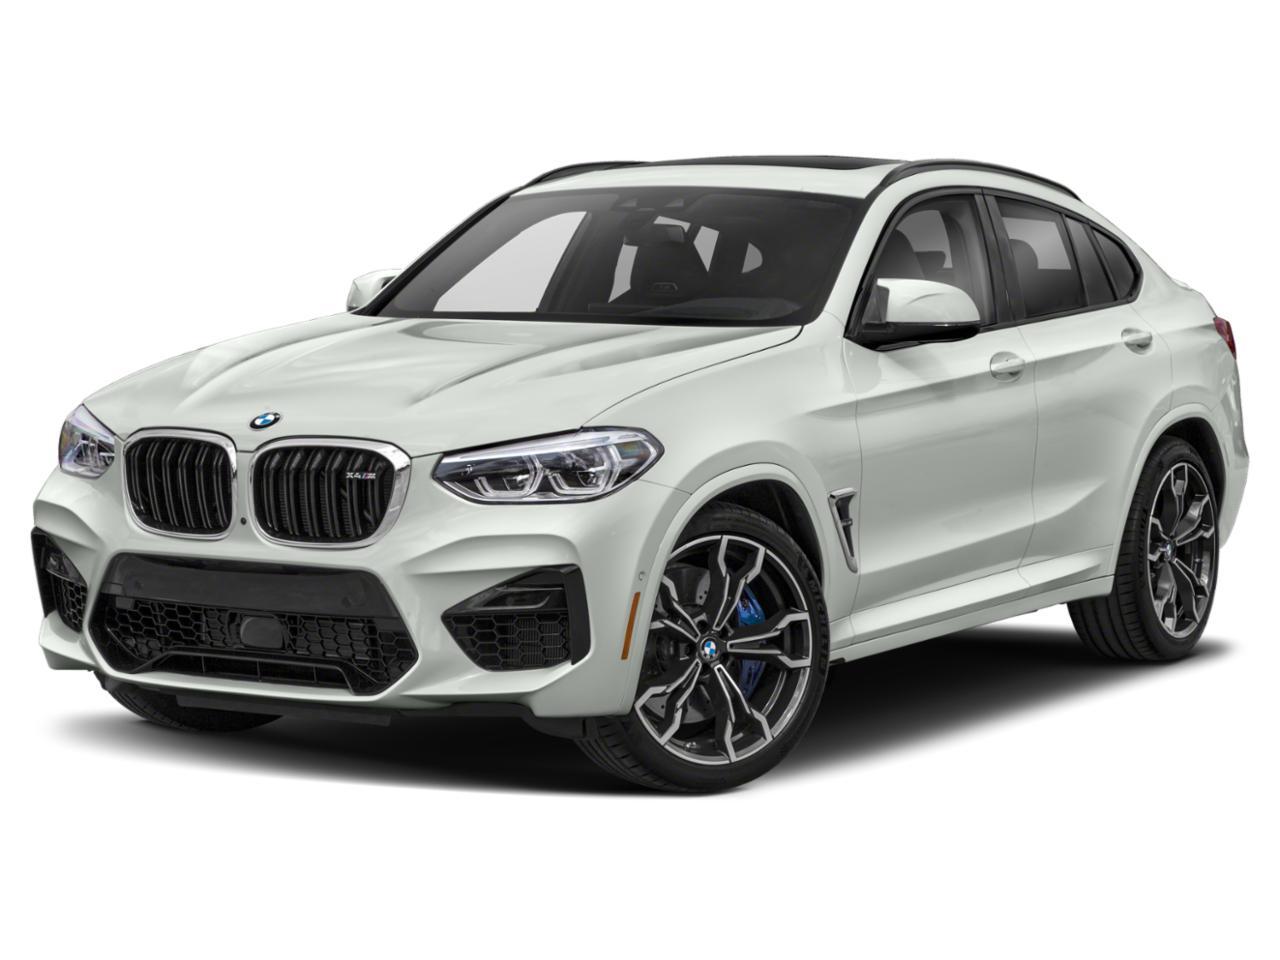 2022 BMW X4 M Vehicle Photo in PLANO, TX 75024-3599